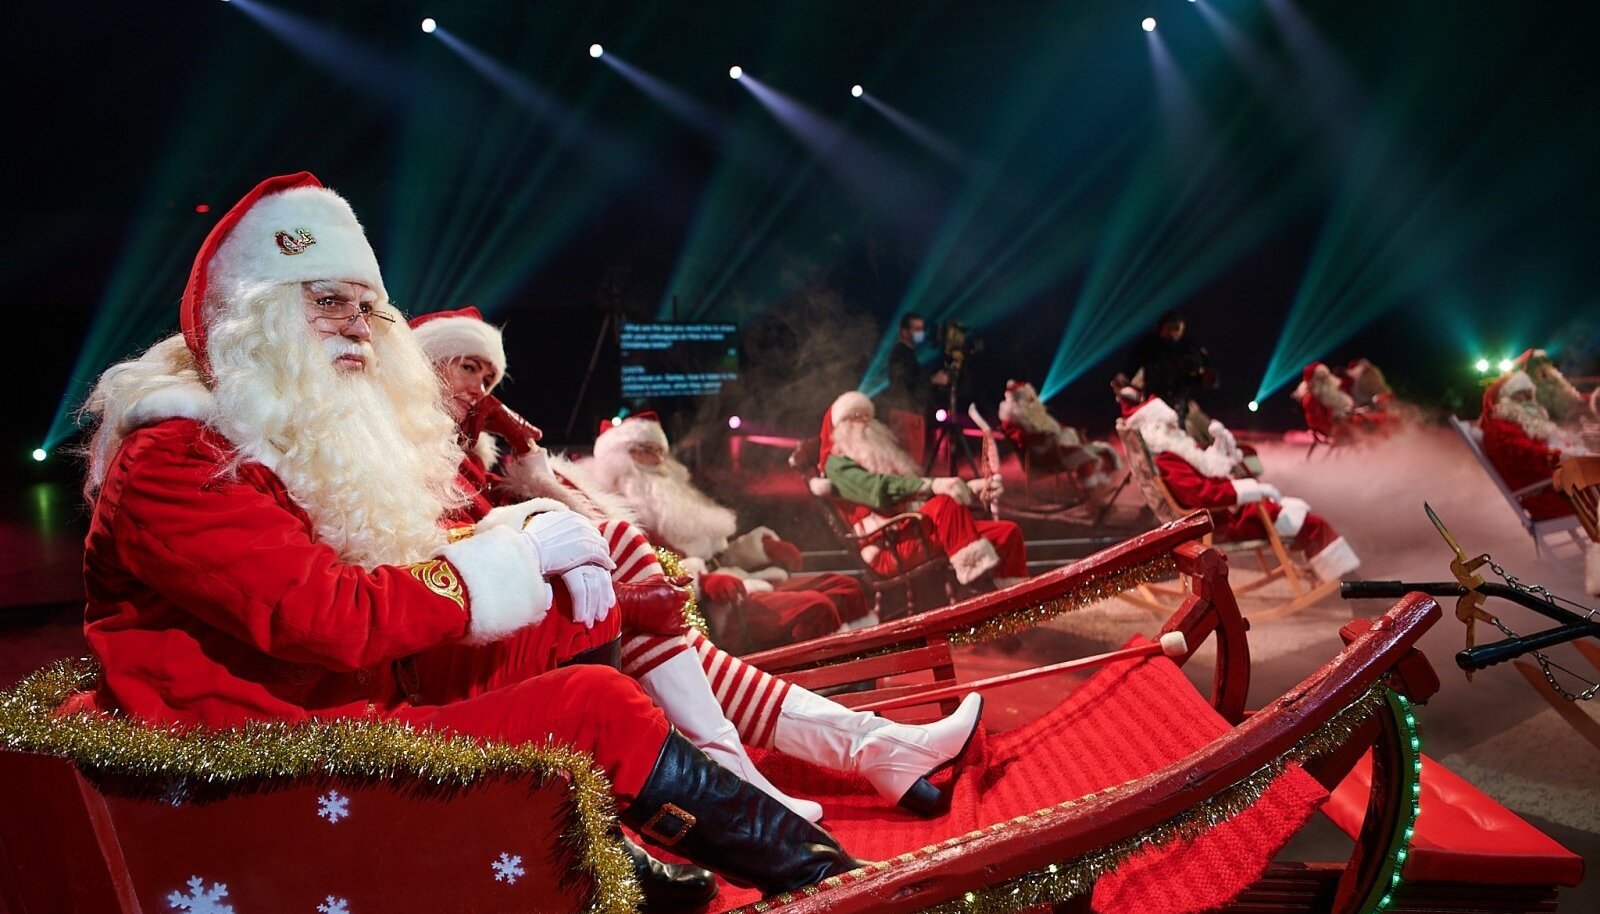 Ülemaailmne Jõuluvanade Kongress